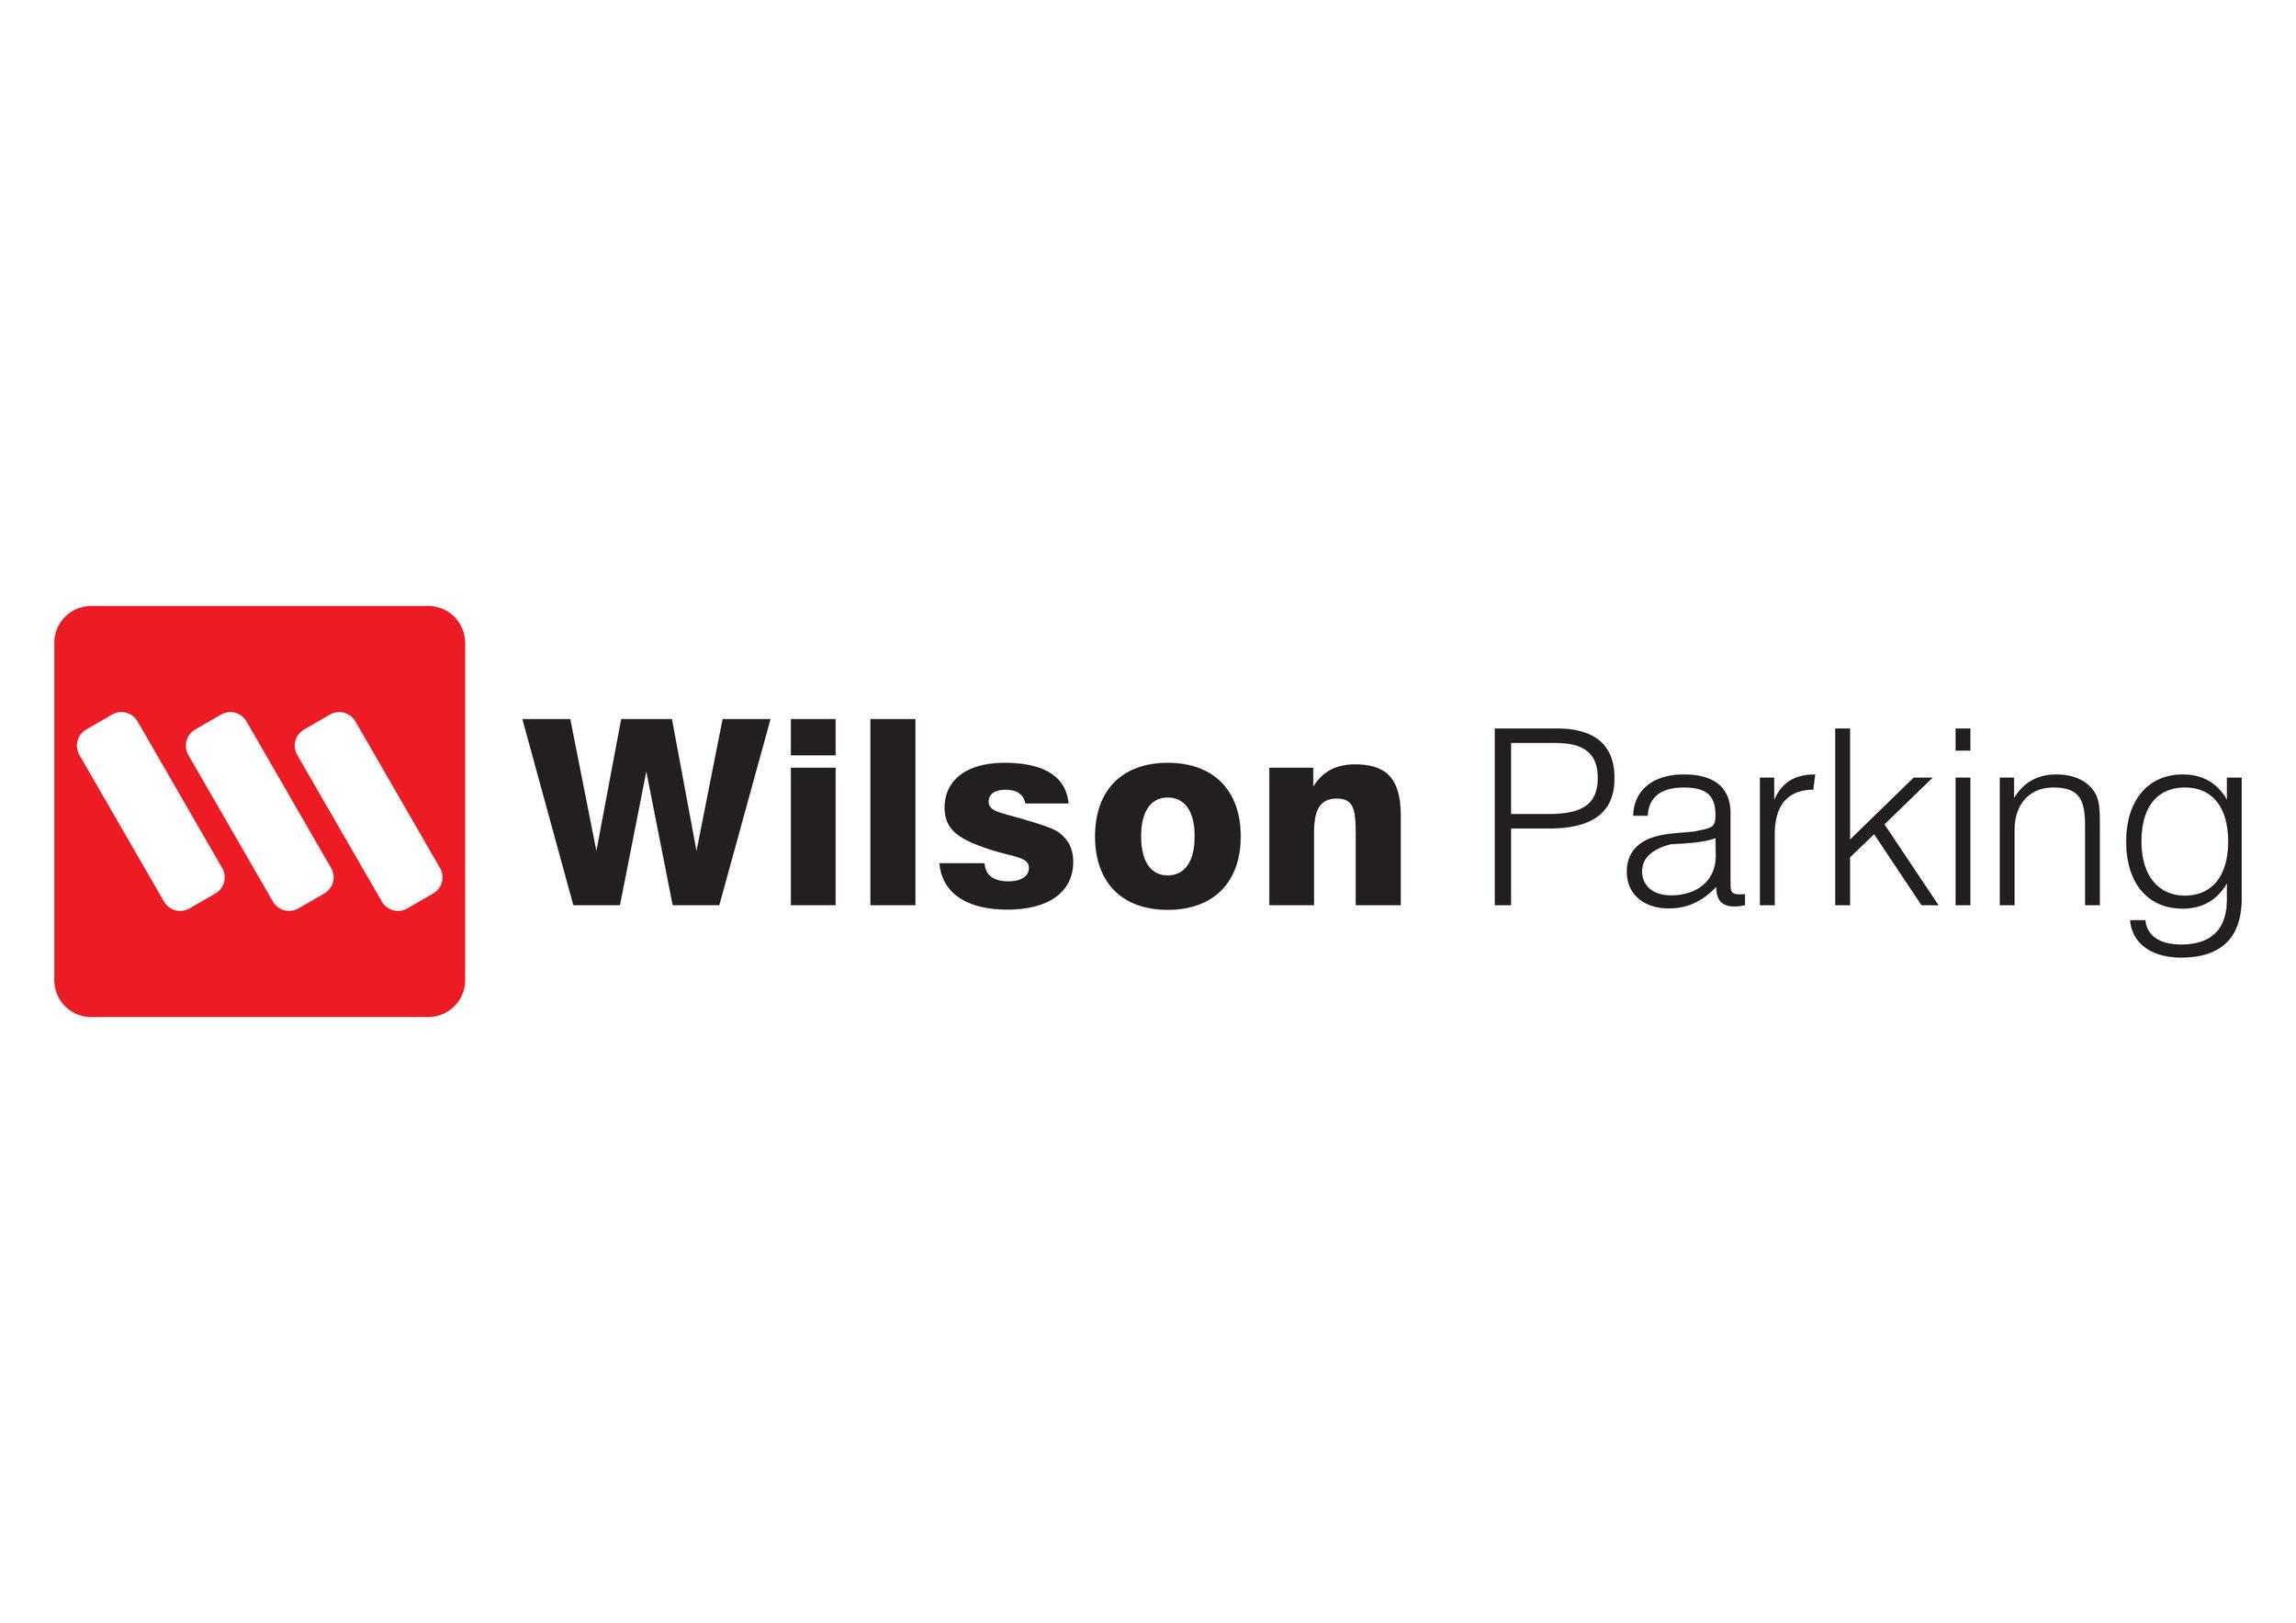 Wilson Parking Large Scale.jpg